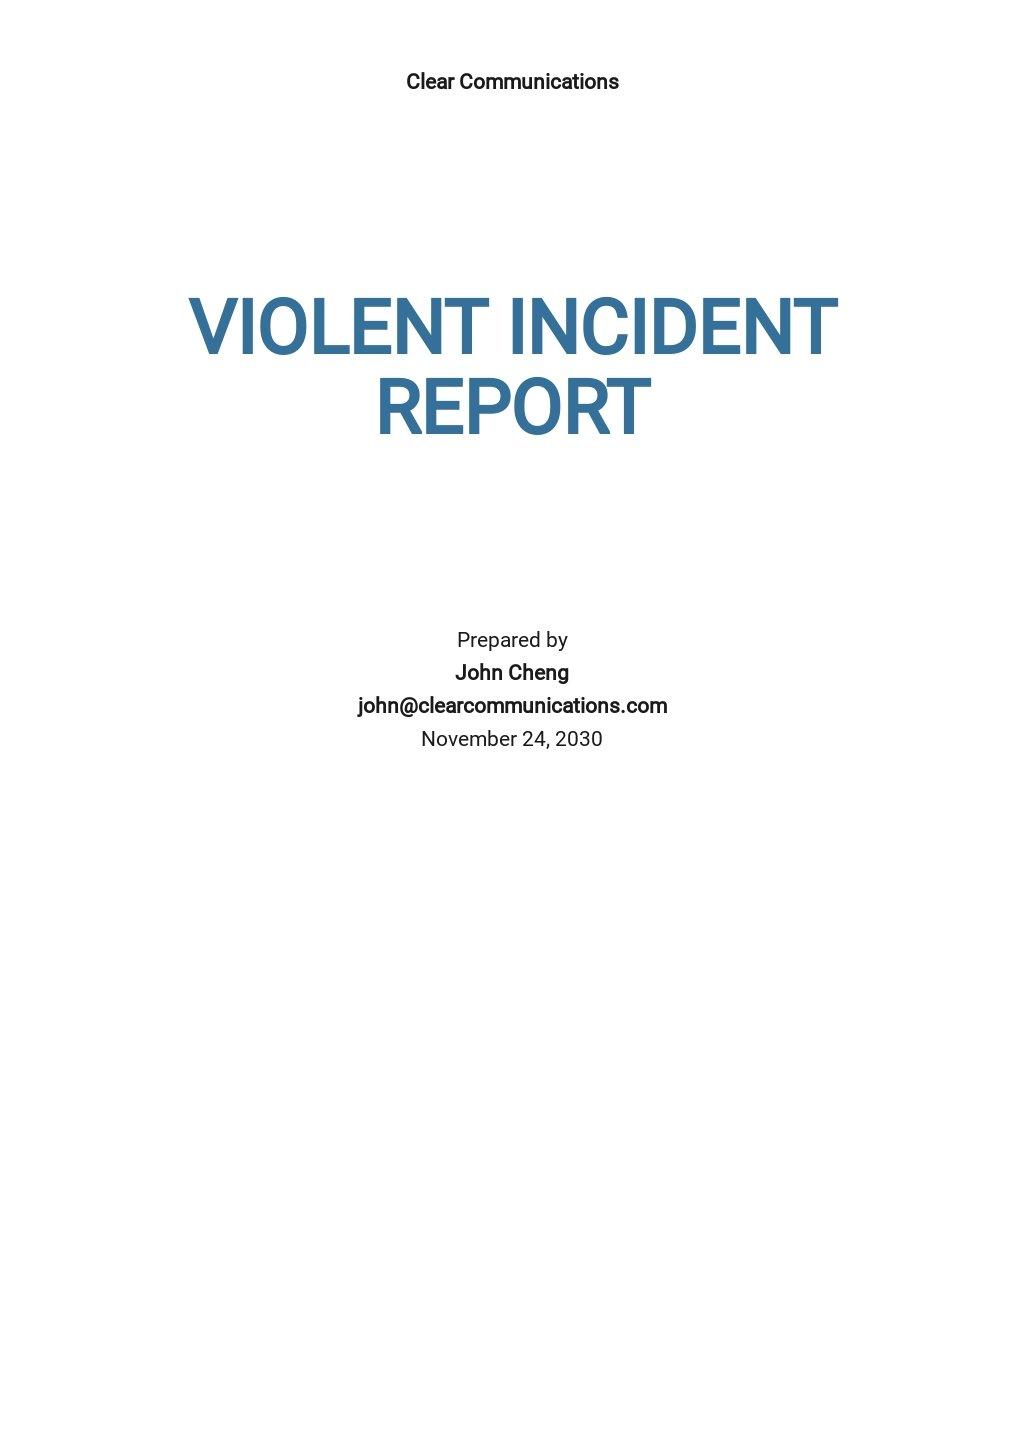 Violent Incident Report Form Template.jpe